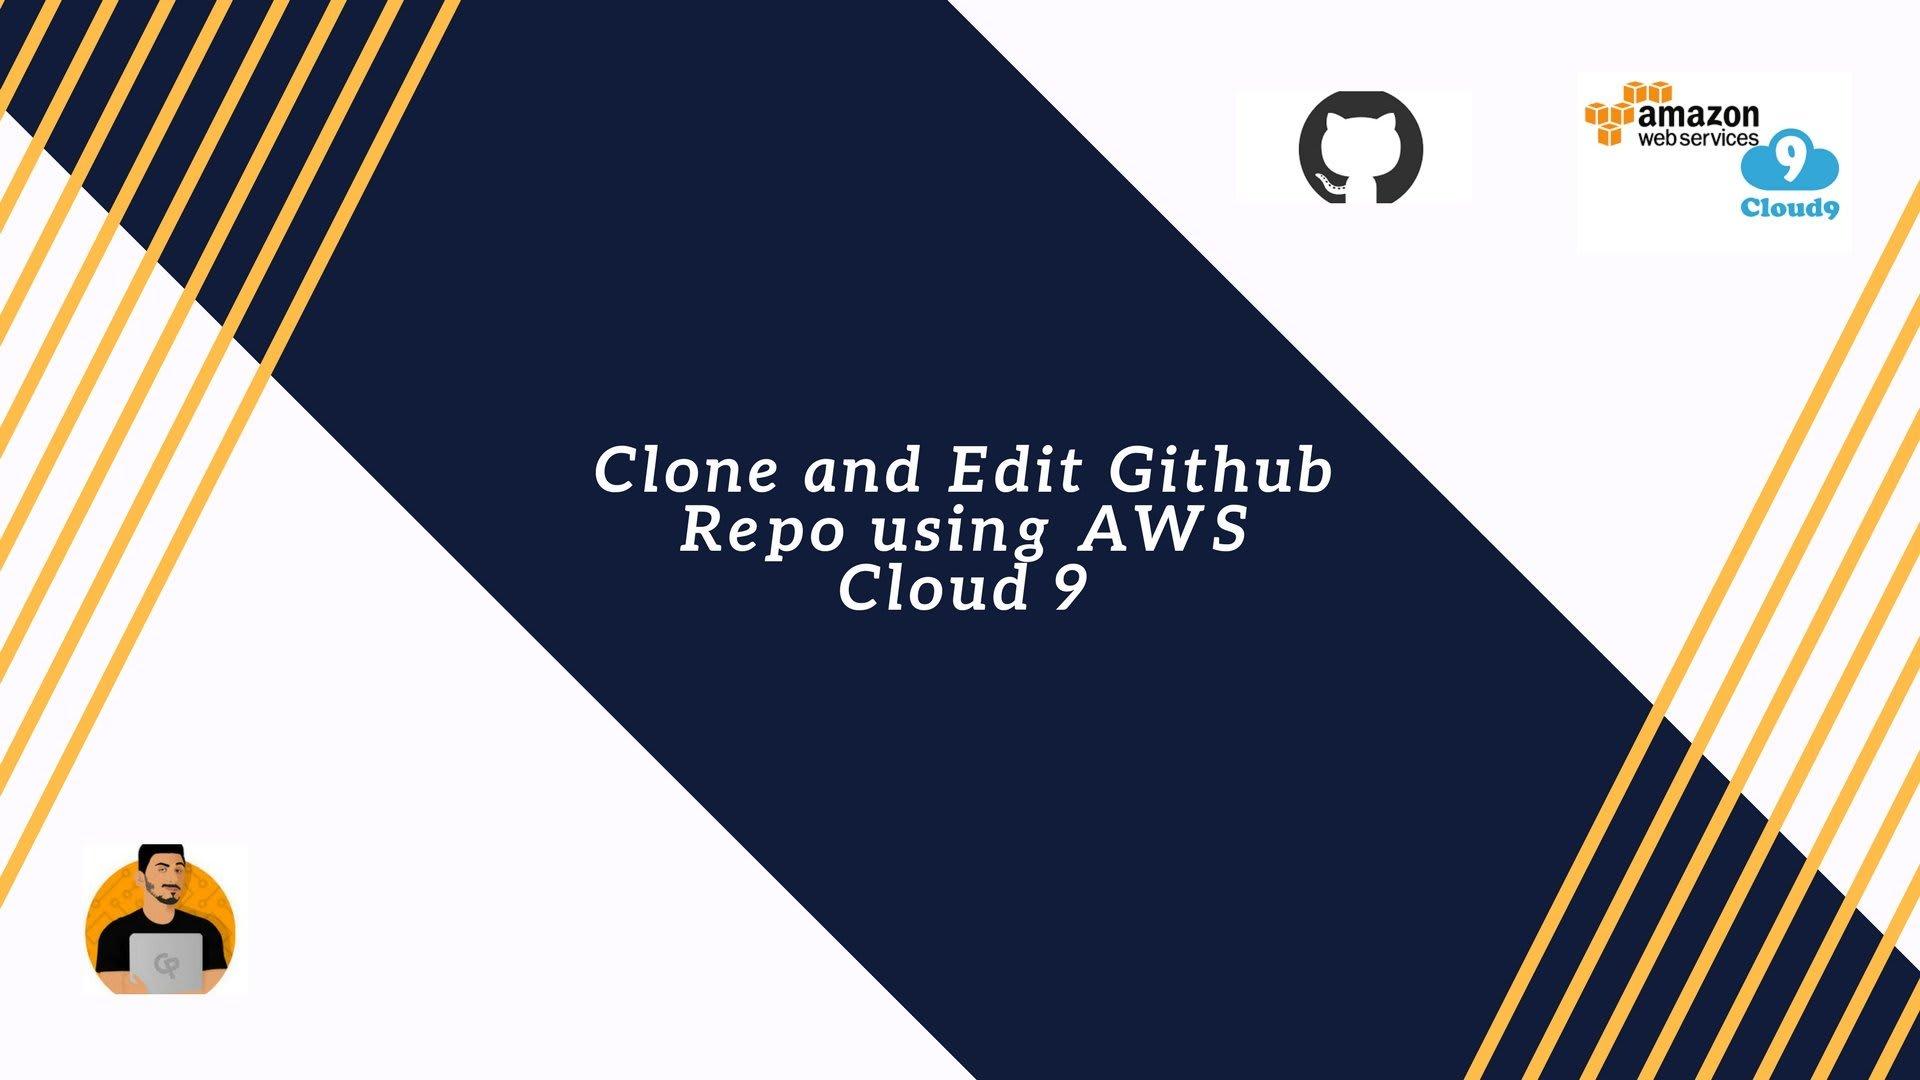 Clone and Edit Github Repo using AWS Cloud 9 ― Scotch io